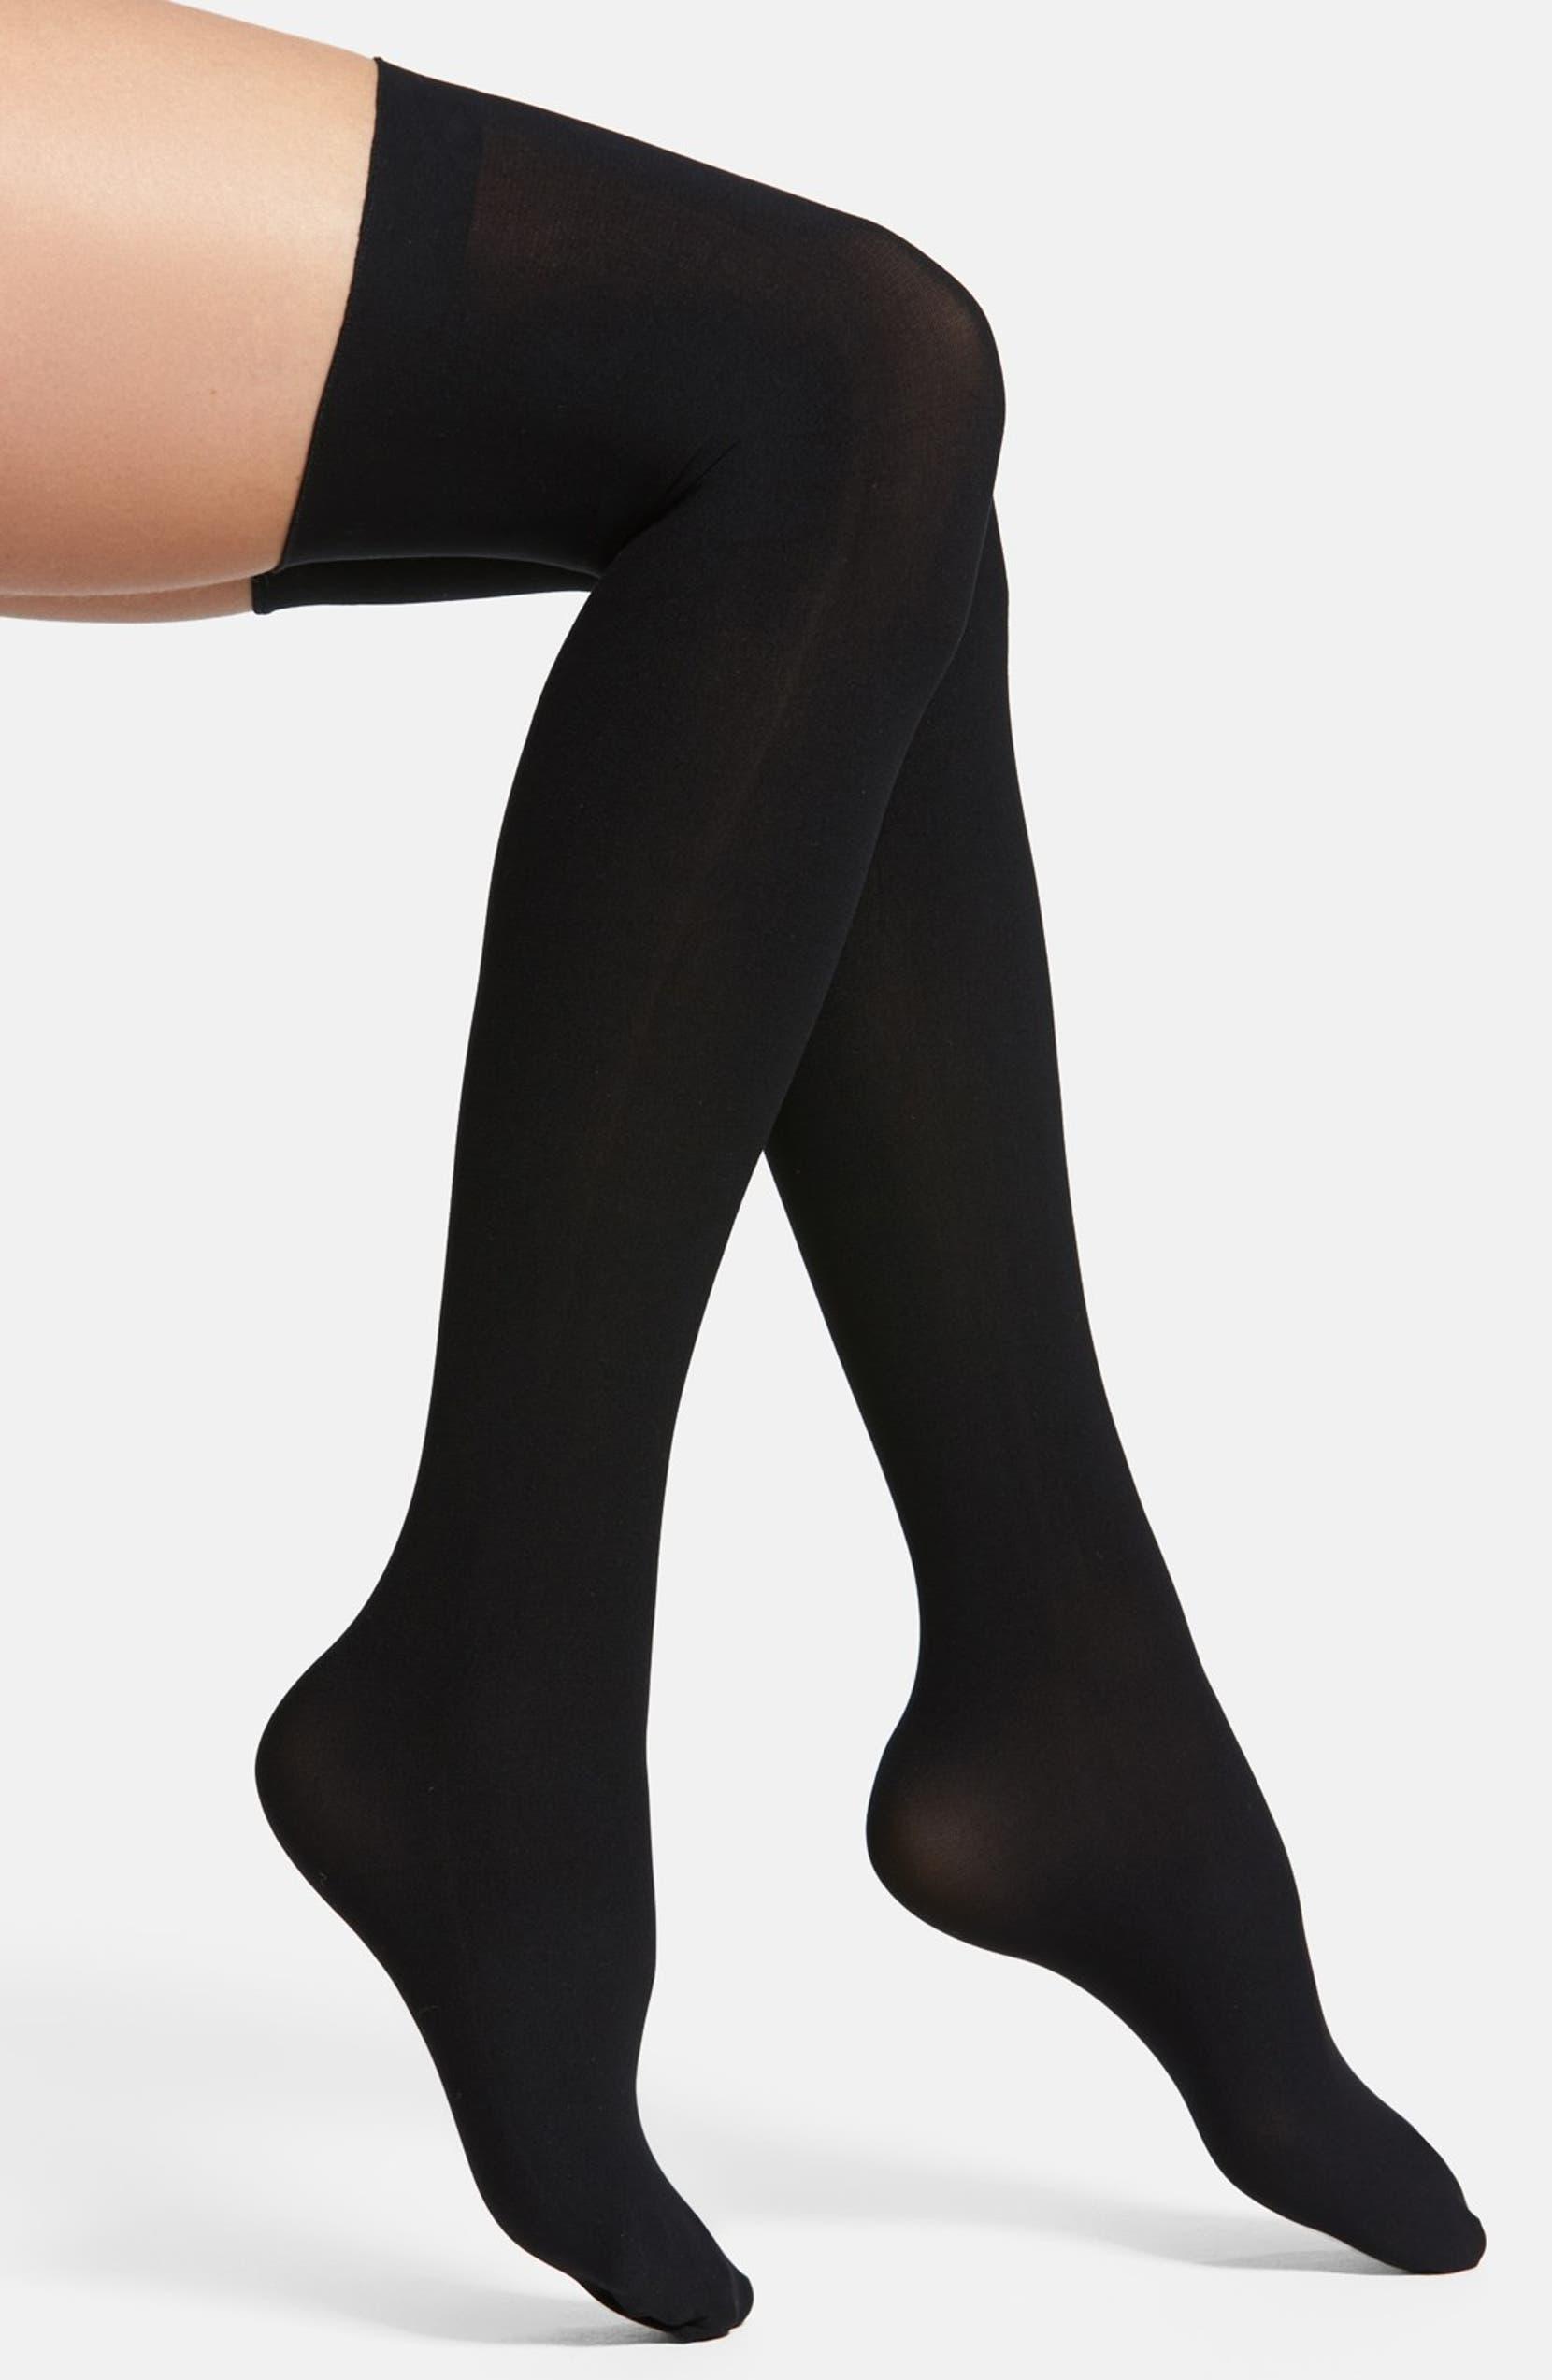 Commando Up All Night Thigh High Socks  3b0ded529